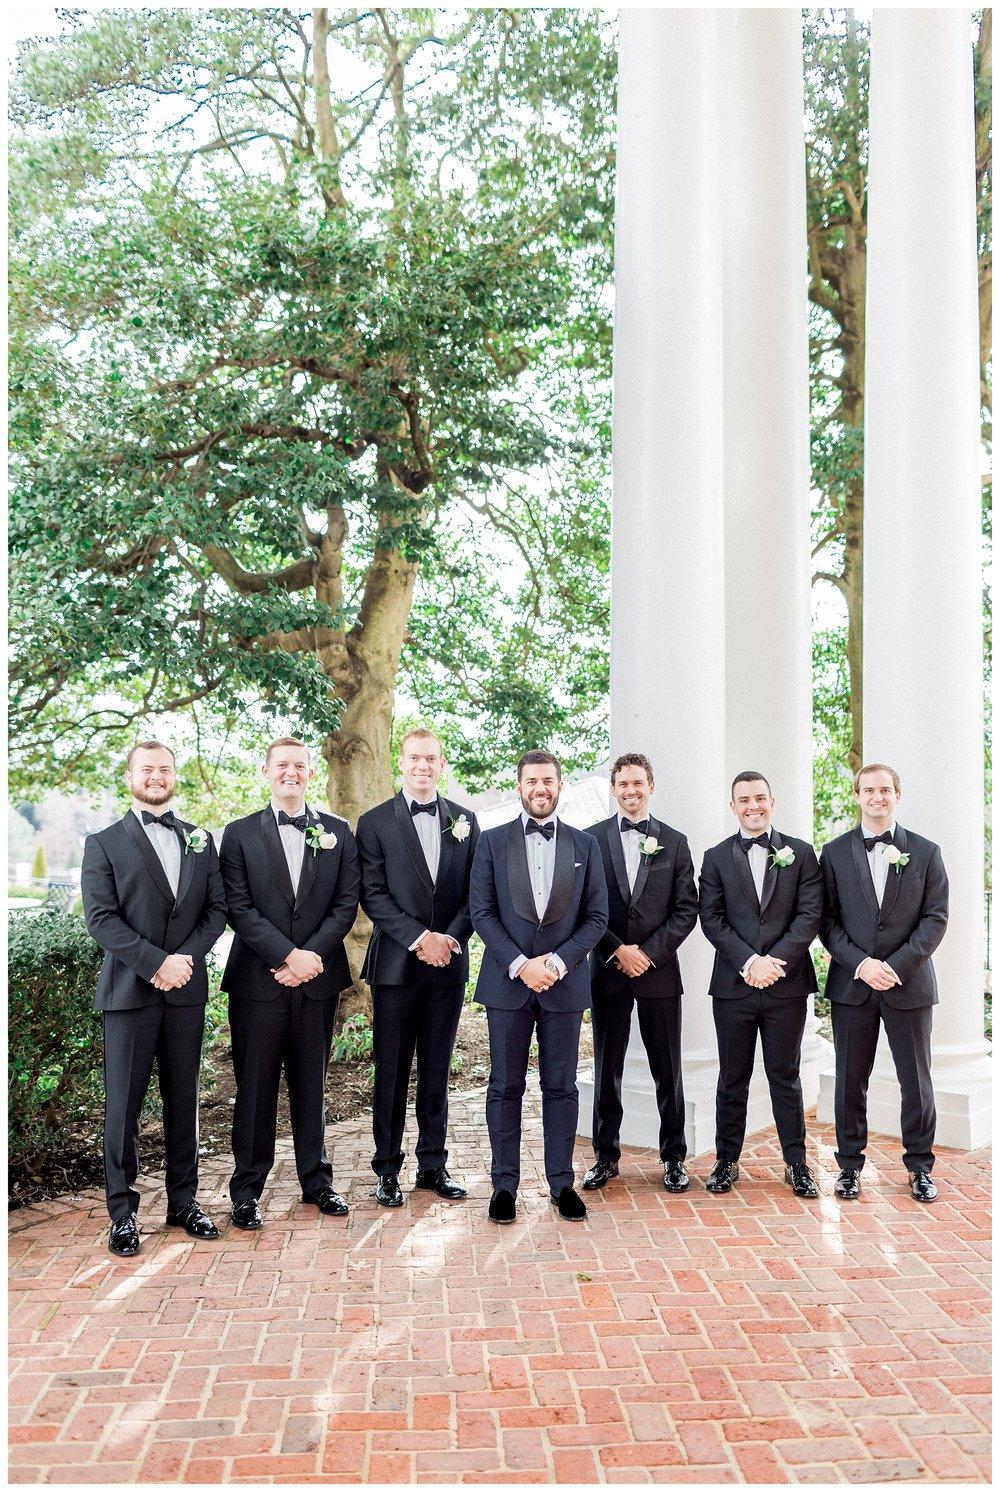 Country Club of Virginia Wedding | Richmond Wedding Photographer_0039.jpg